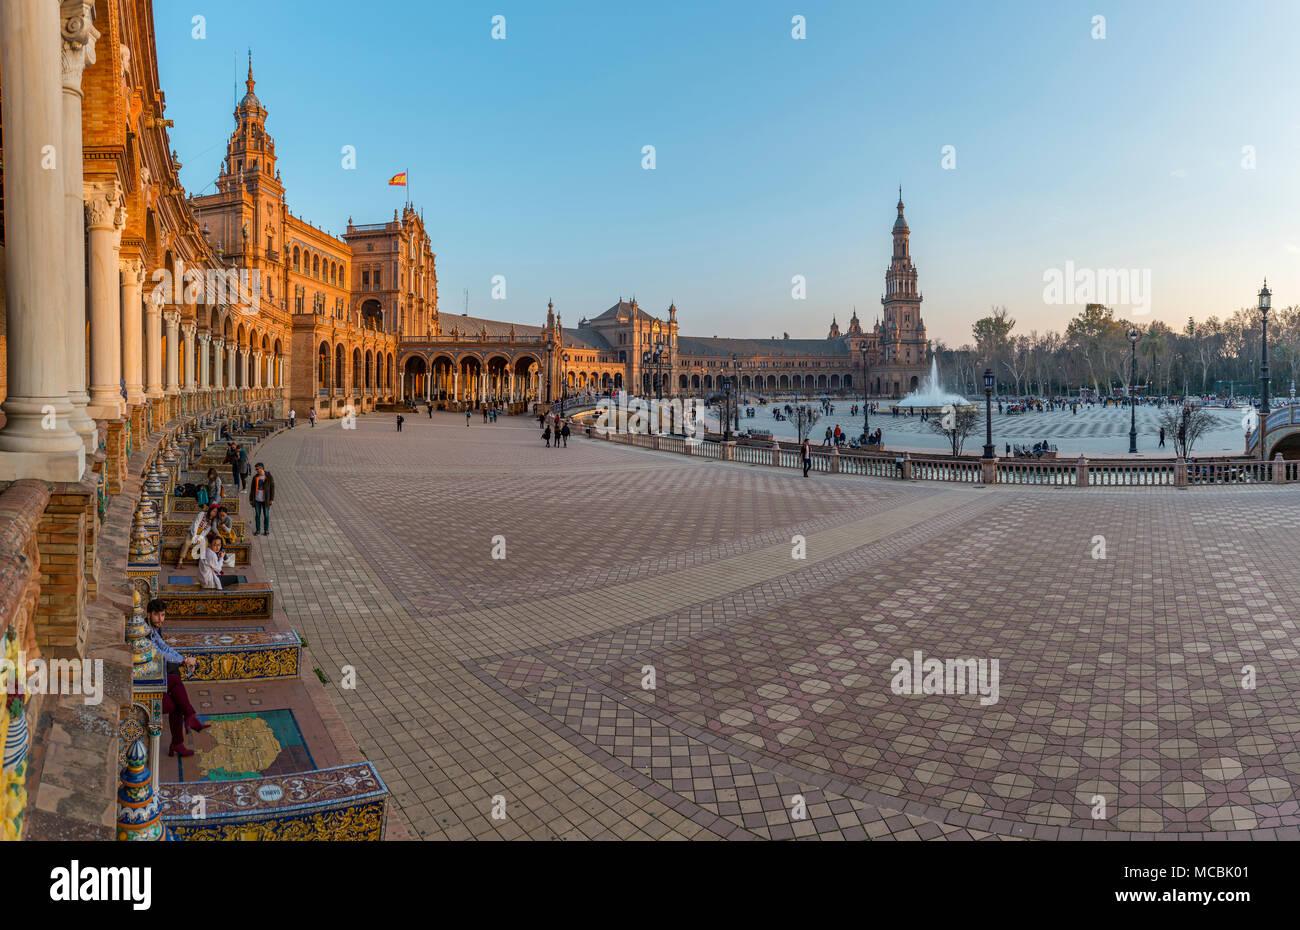 National Geographic Institute, Plaza de España, Seville, Spain - Stock Image